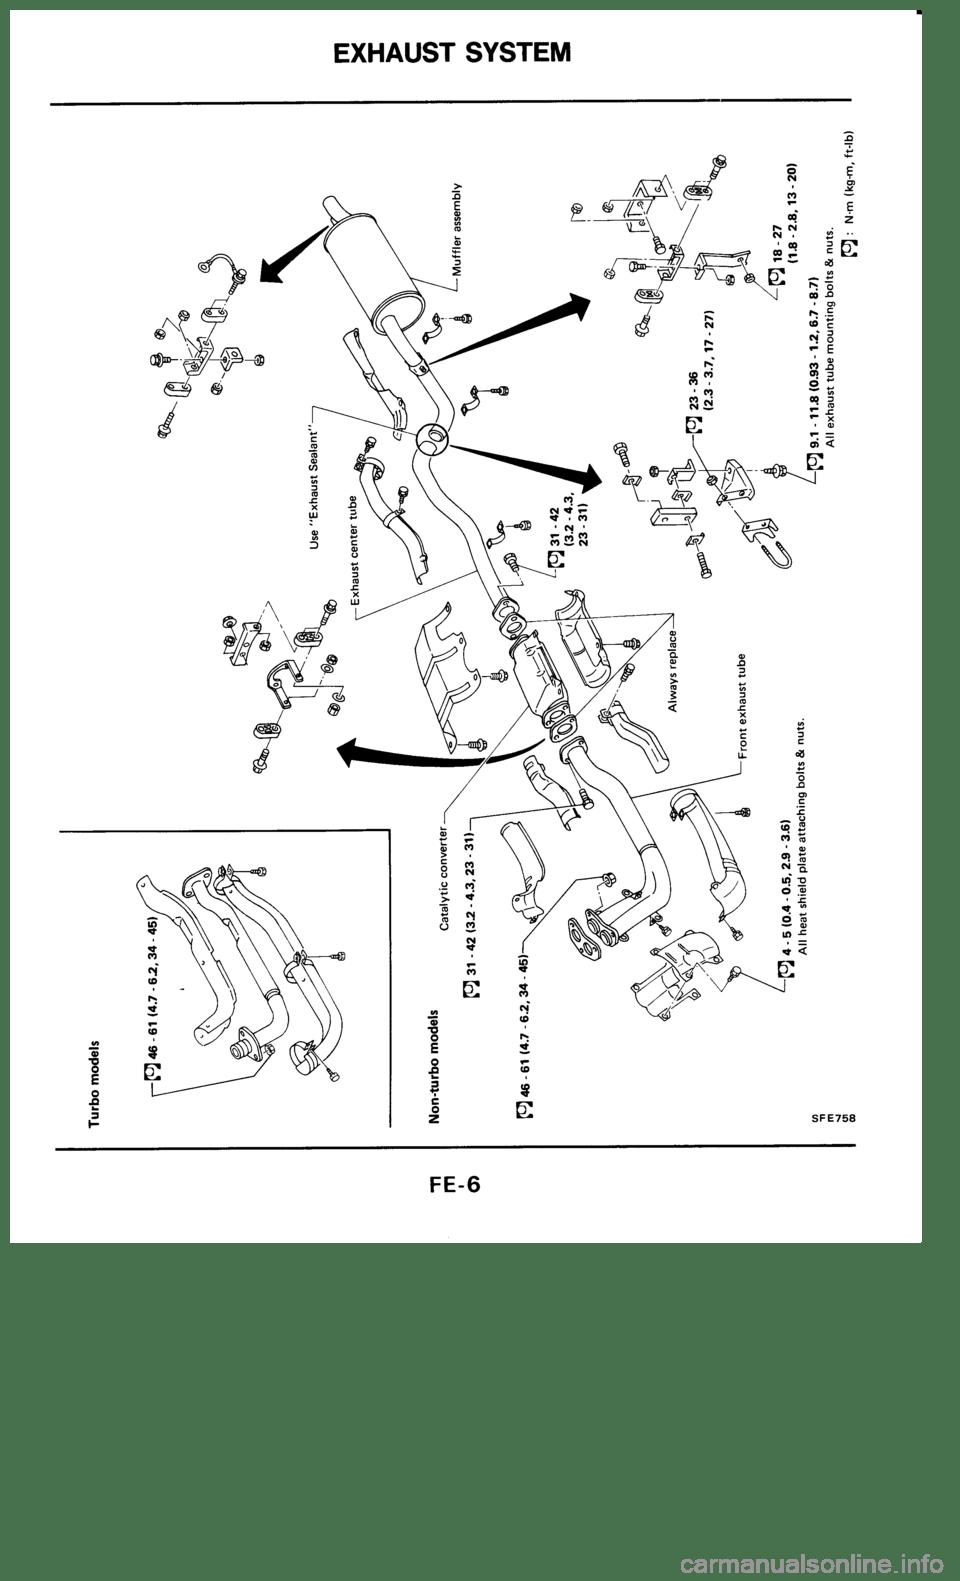 hight resolution of 1986 5 0 engine diagram